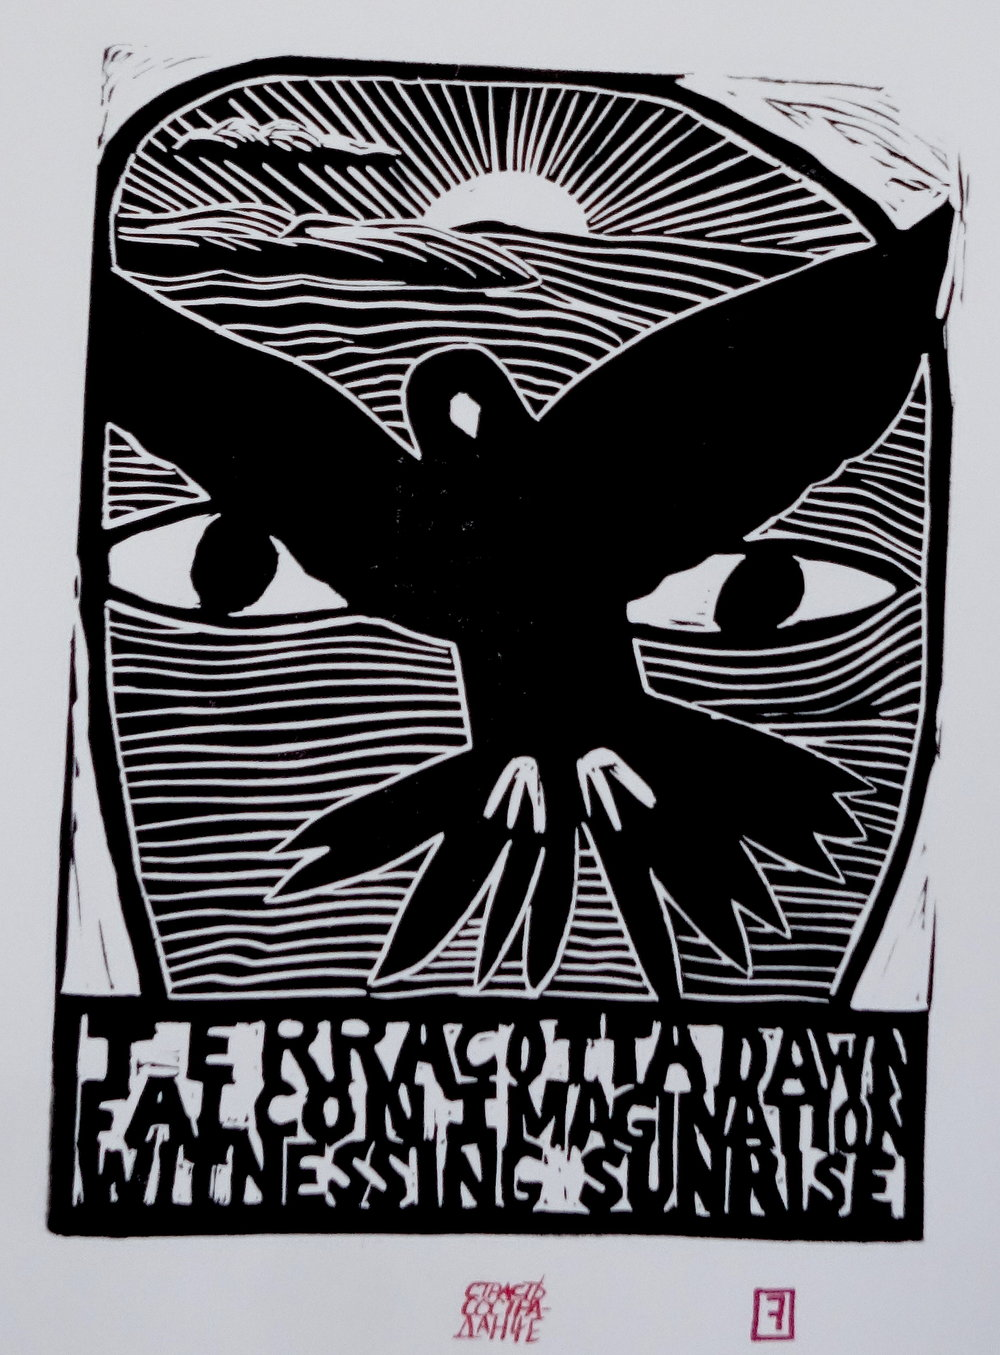 Terracotta Dawn/Falcon Imagination/Witnessing Sunrise